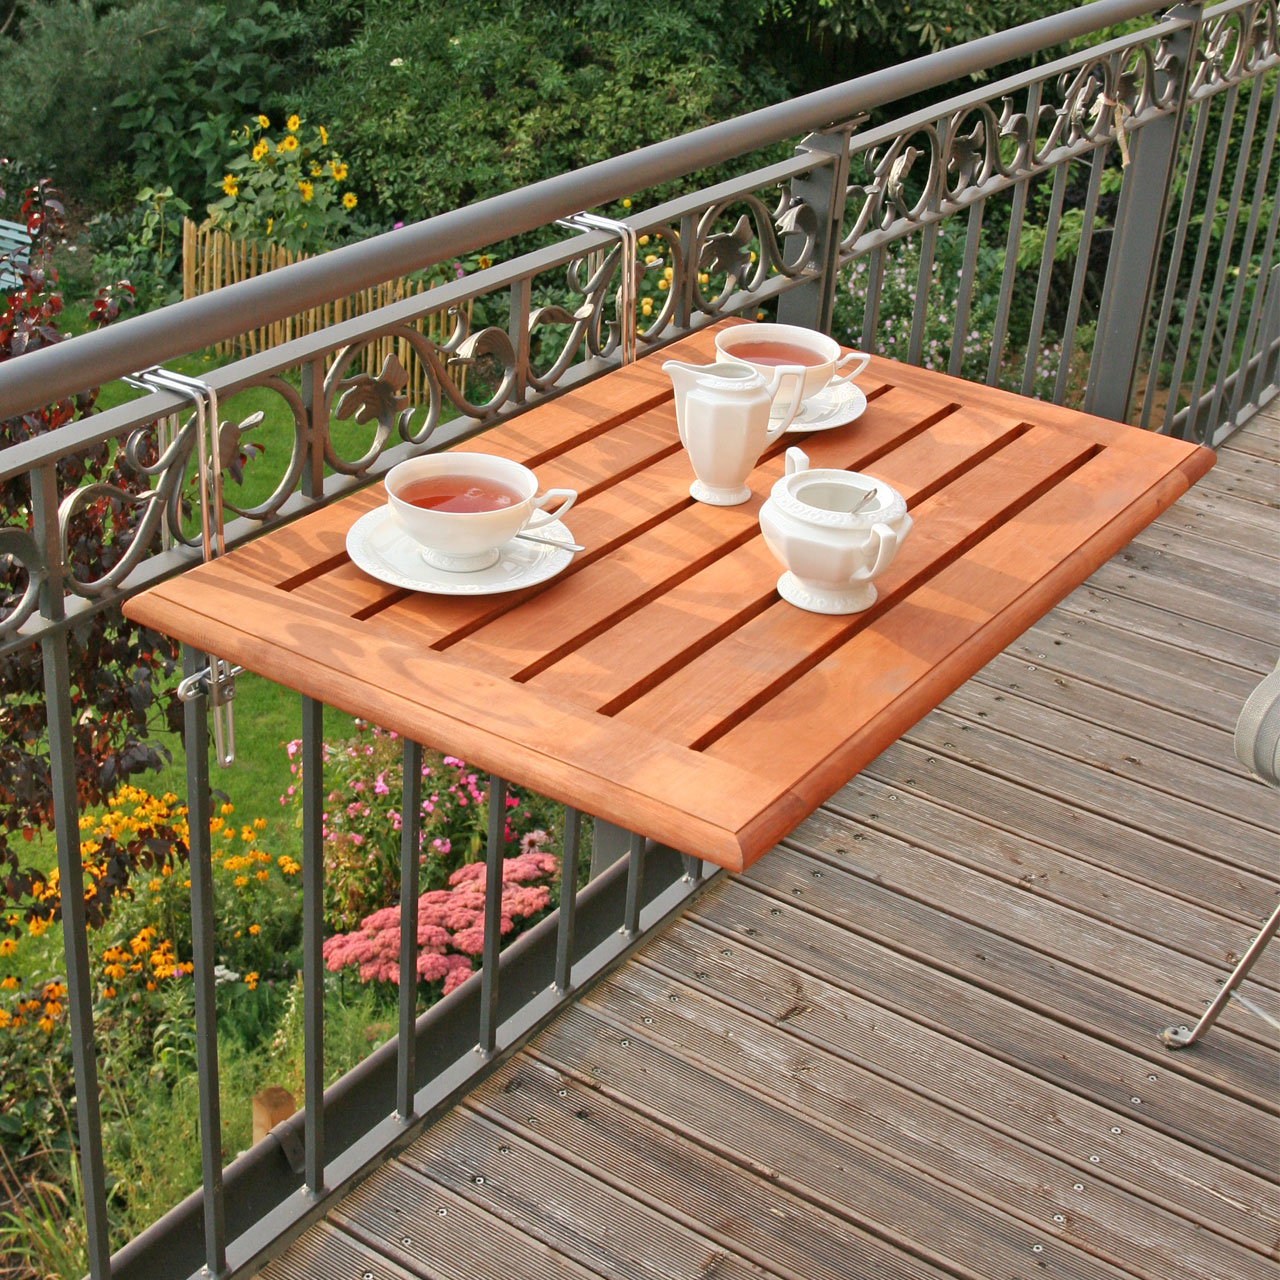 Balkonklapptisch  Balkonklapptisch, Bambusholz 50 x 80cm | Balkonerlebnis.de